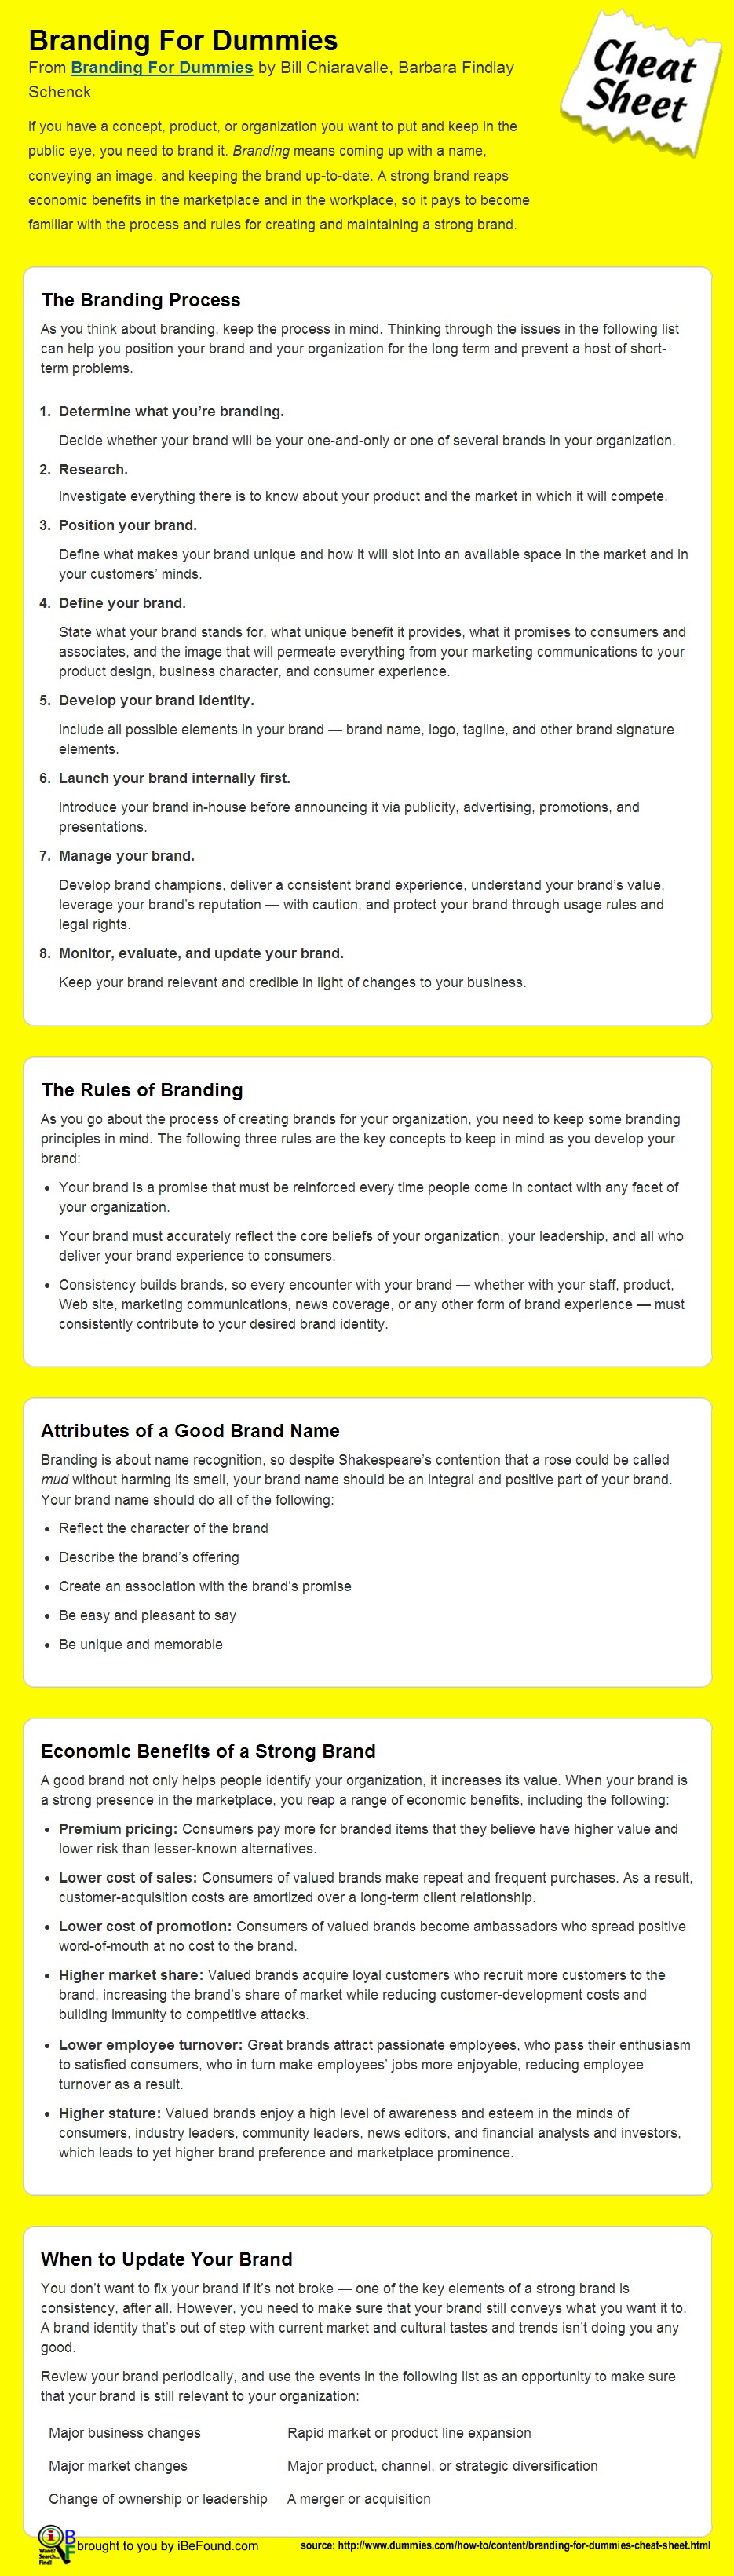 Branding for Dummies Cheat Sheet dummies